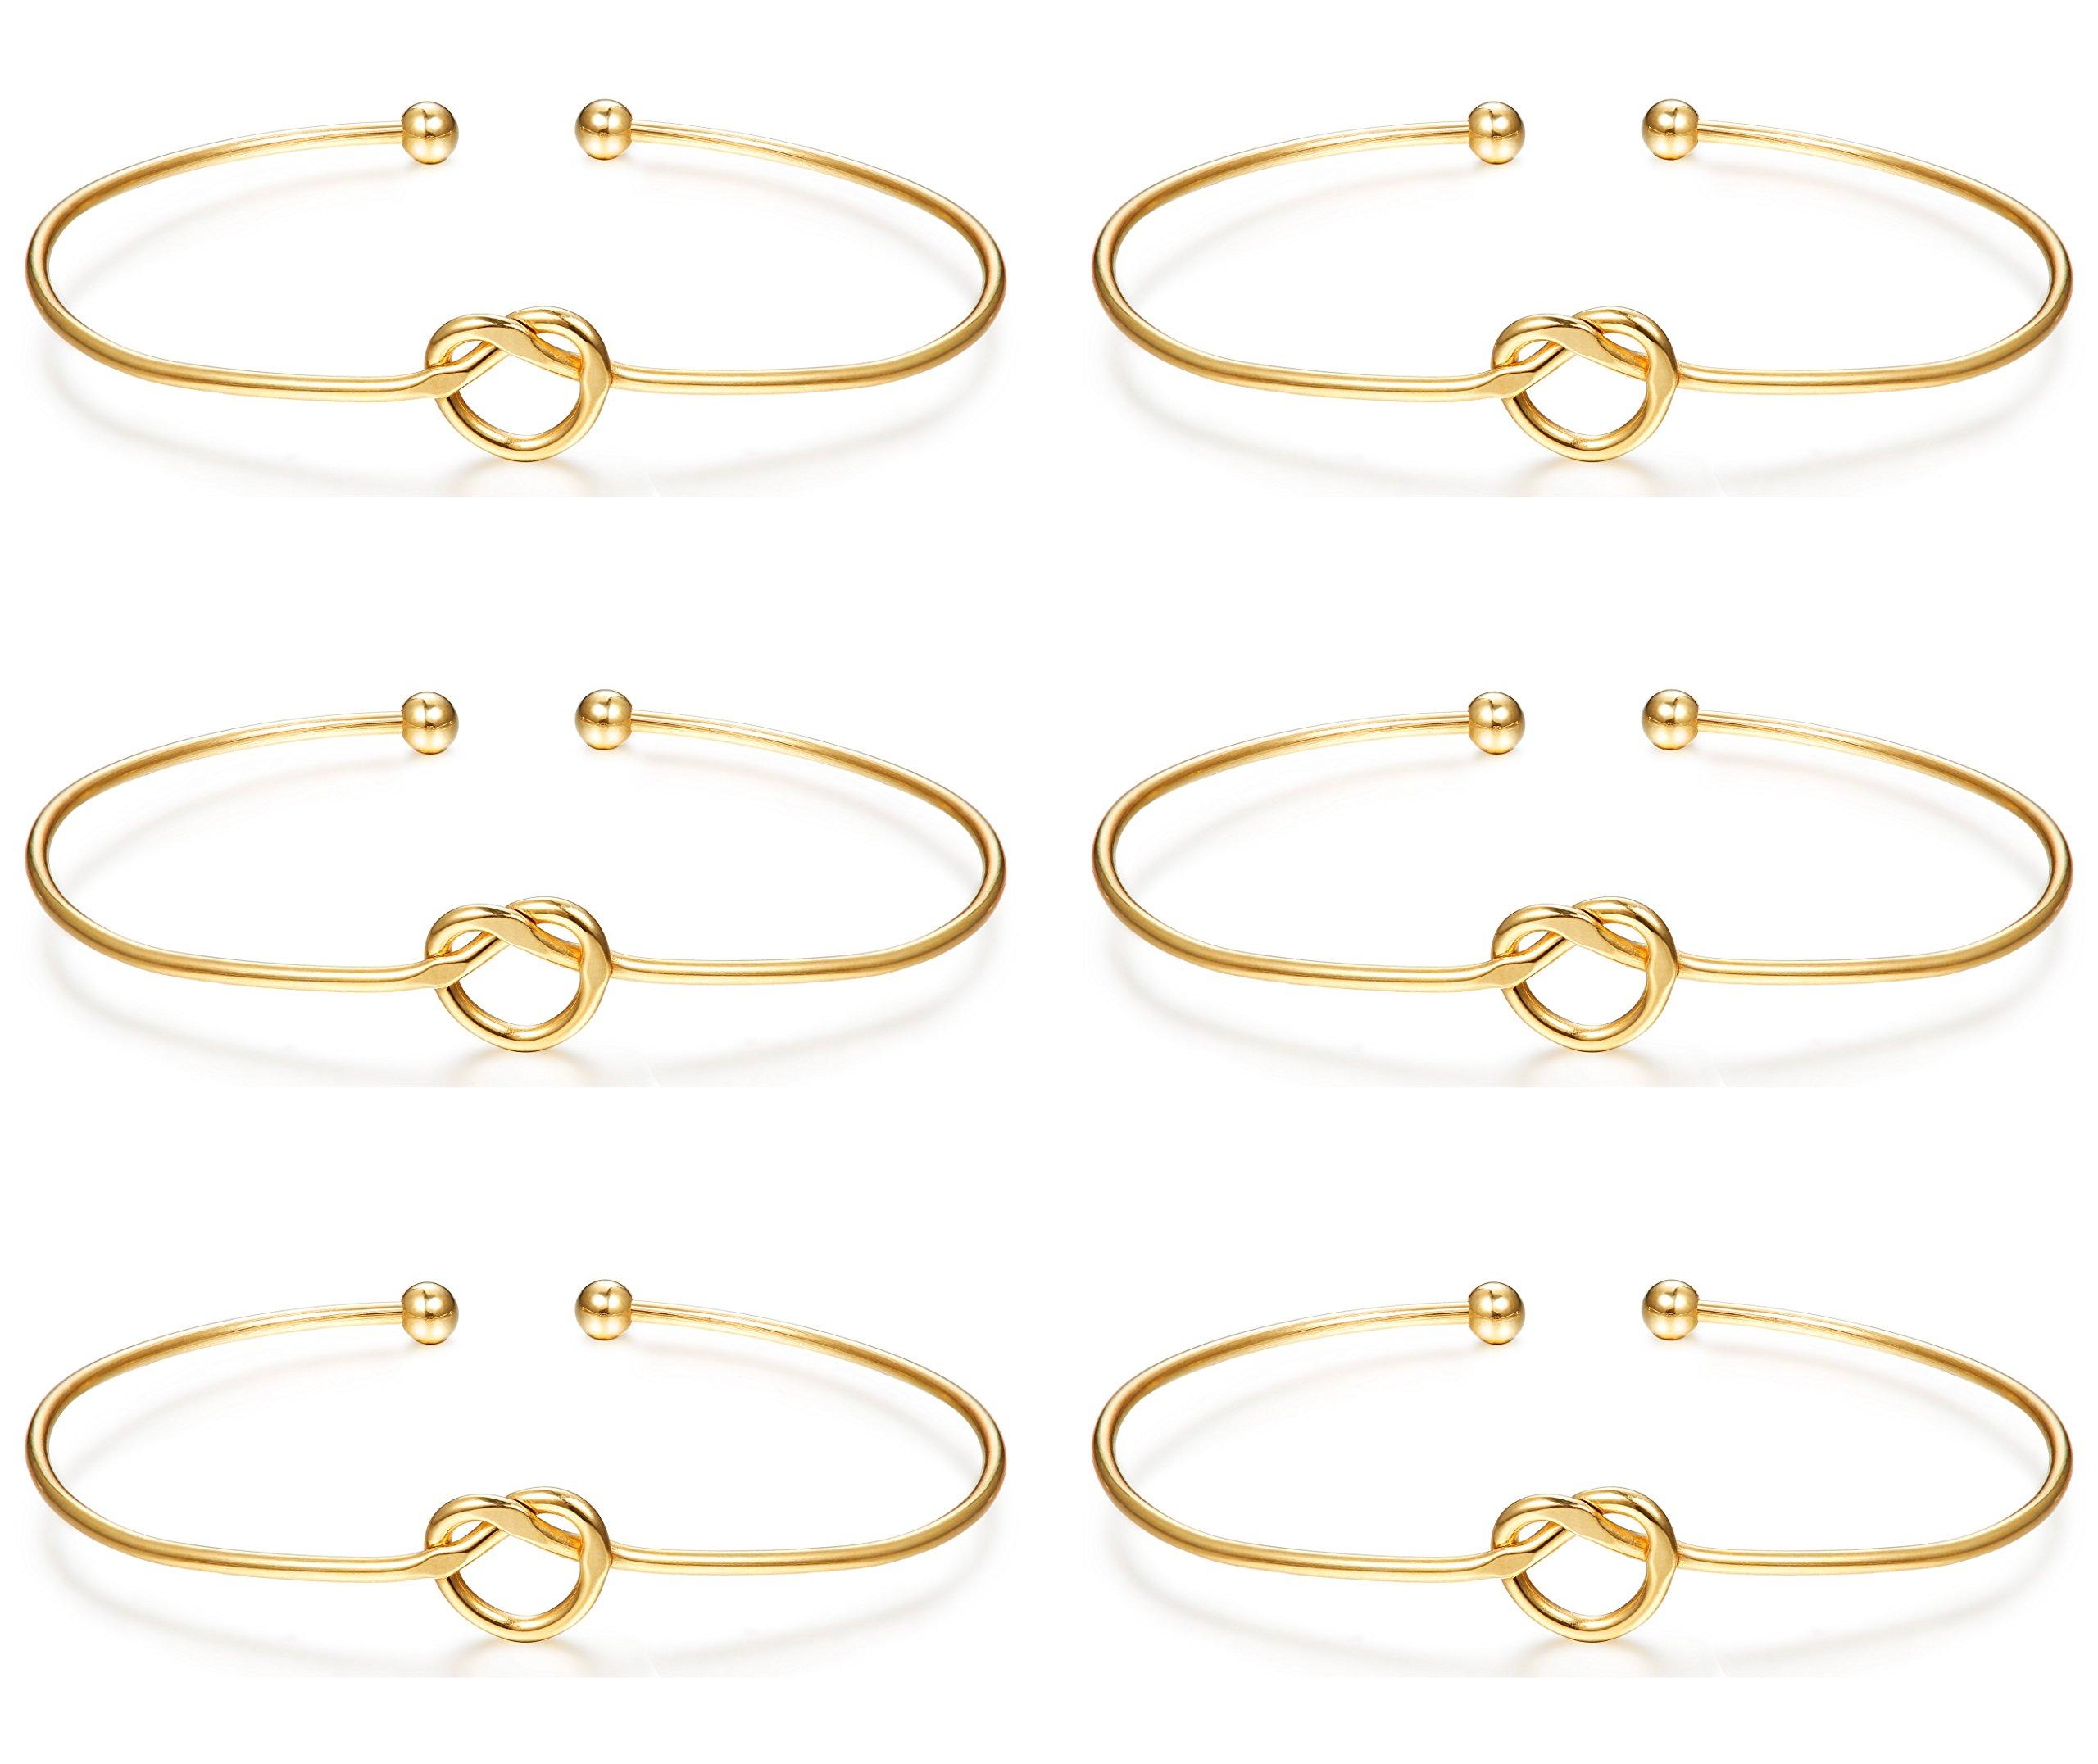 LOLIAS 6 Pcs Love Knot Bangle Bracelets Simple Cuffs Bracelets for Women Girls Stretch Bracelets Adjustable Gold-tone